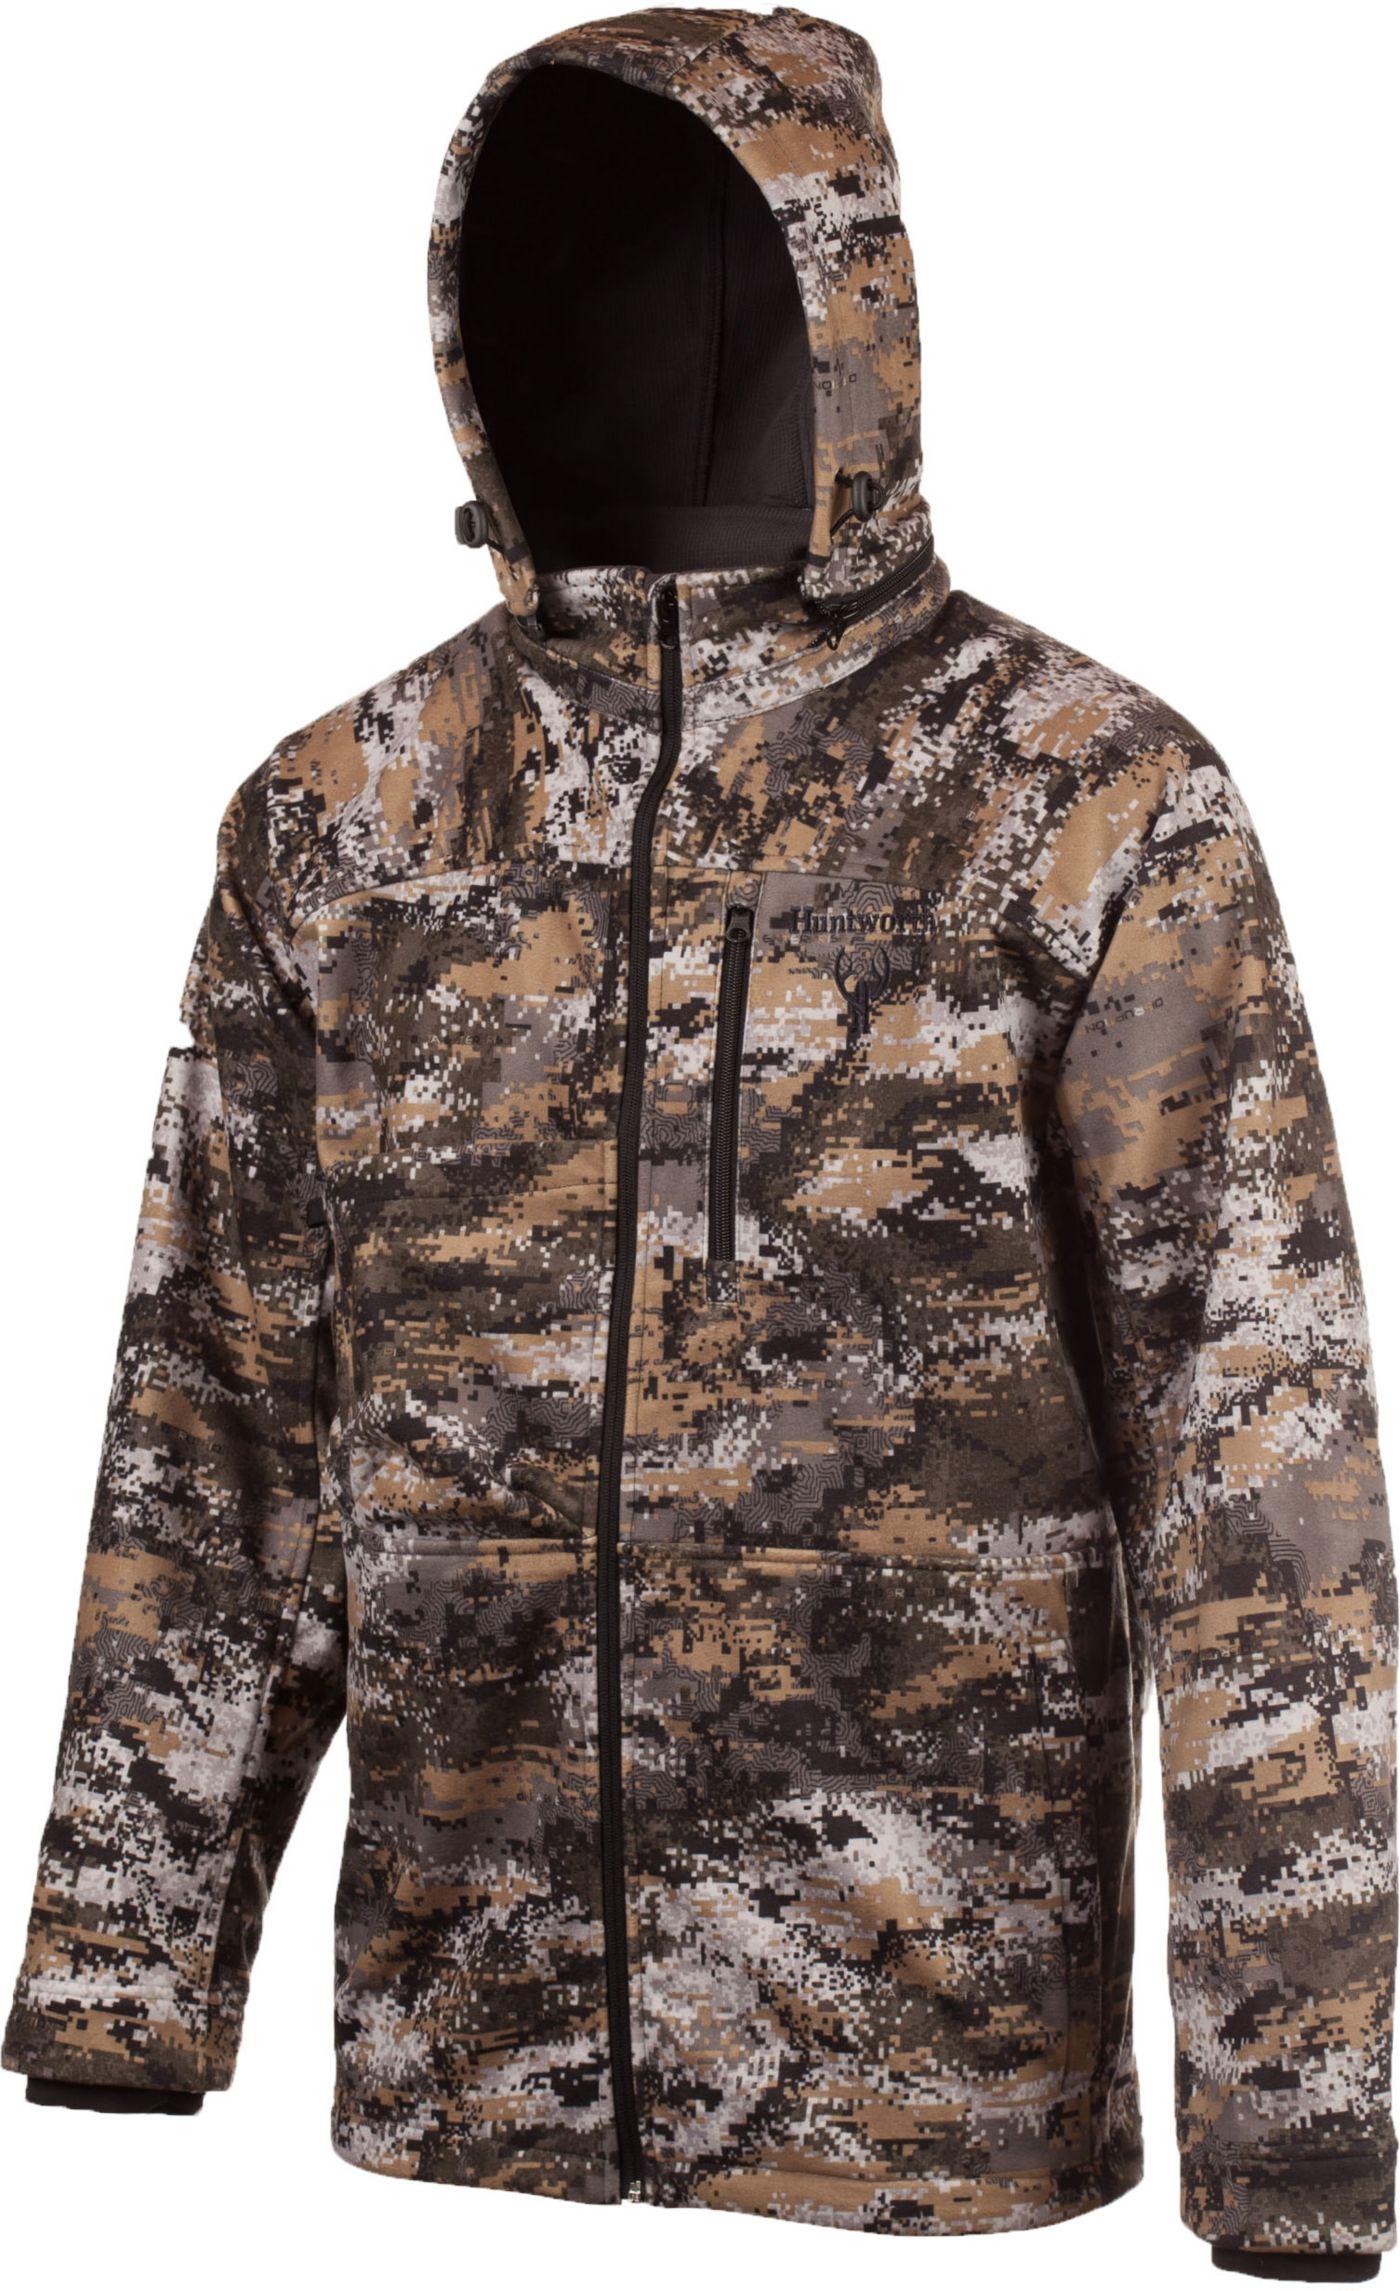 Huntworth Men's Soft Shell Hunting Jacket